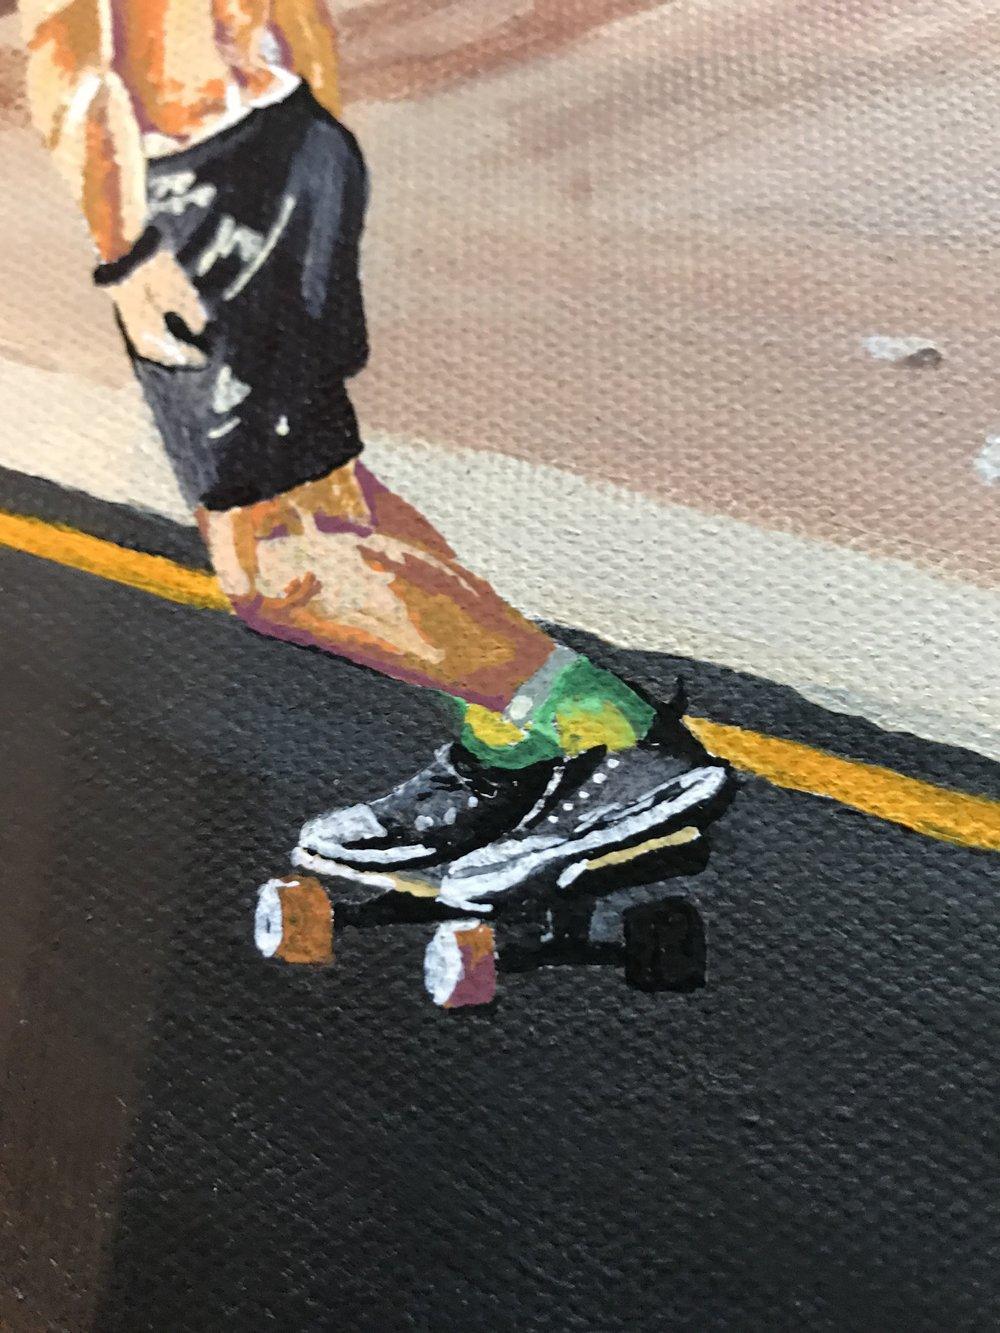 Death Valley Skateboarder Closeup